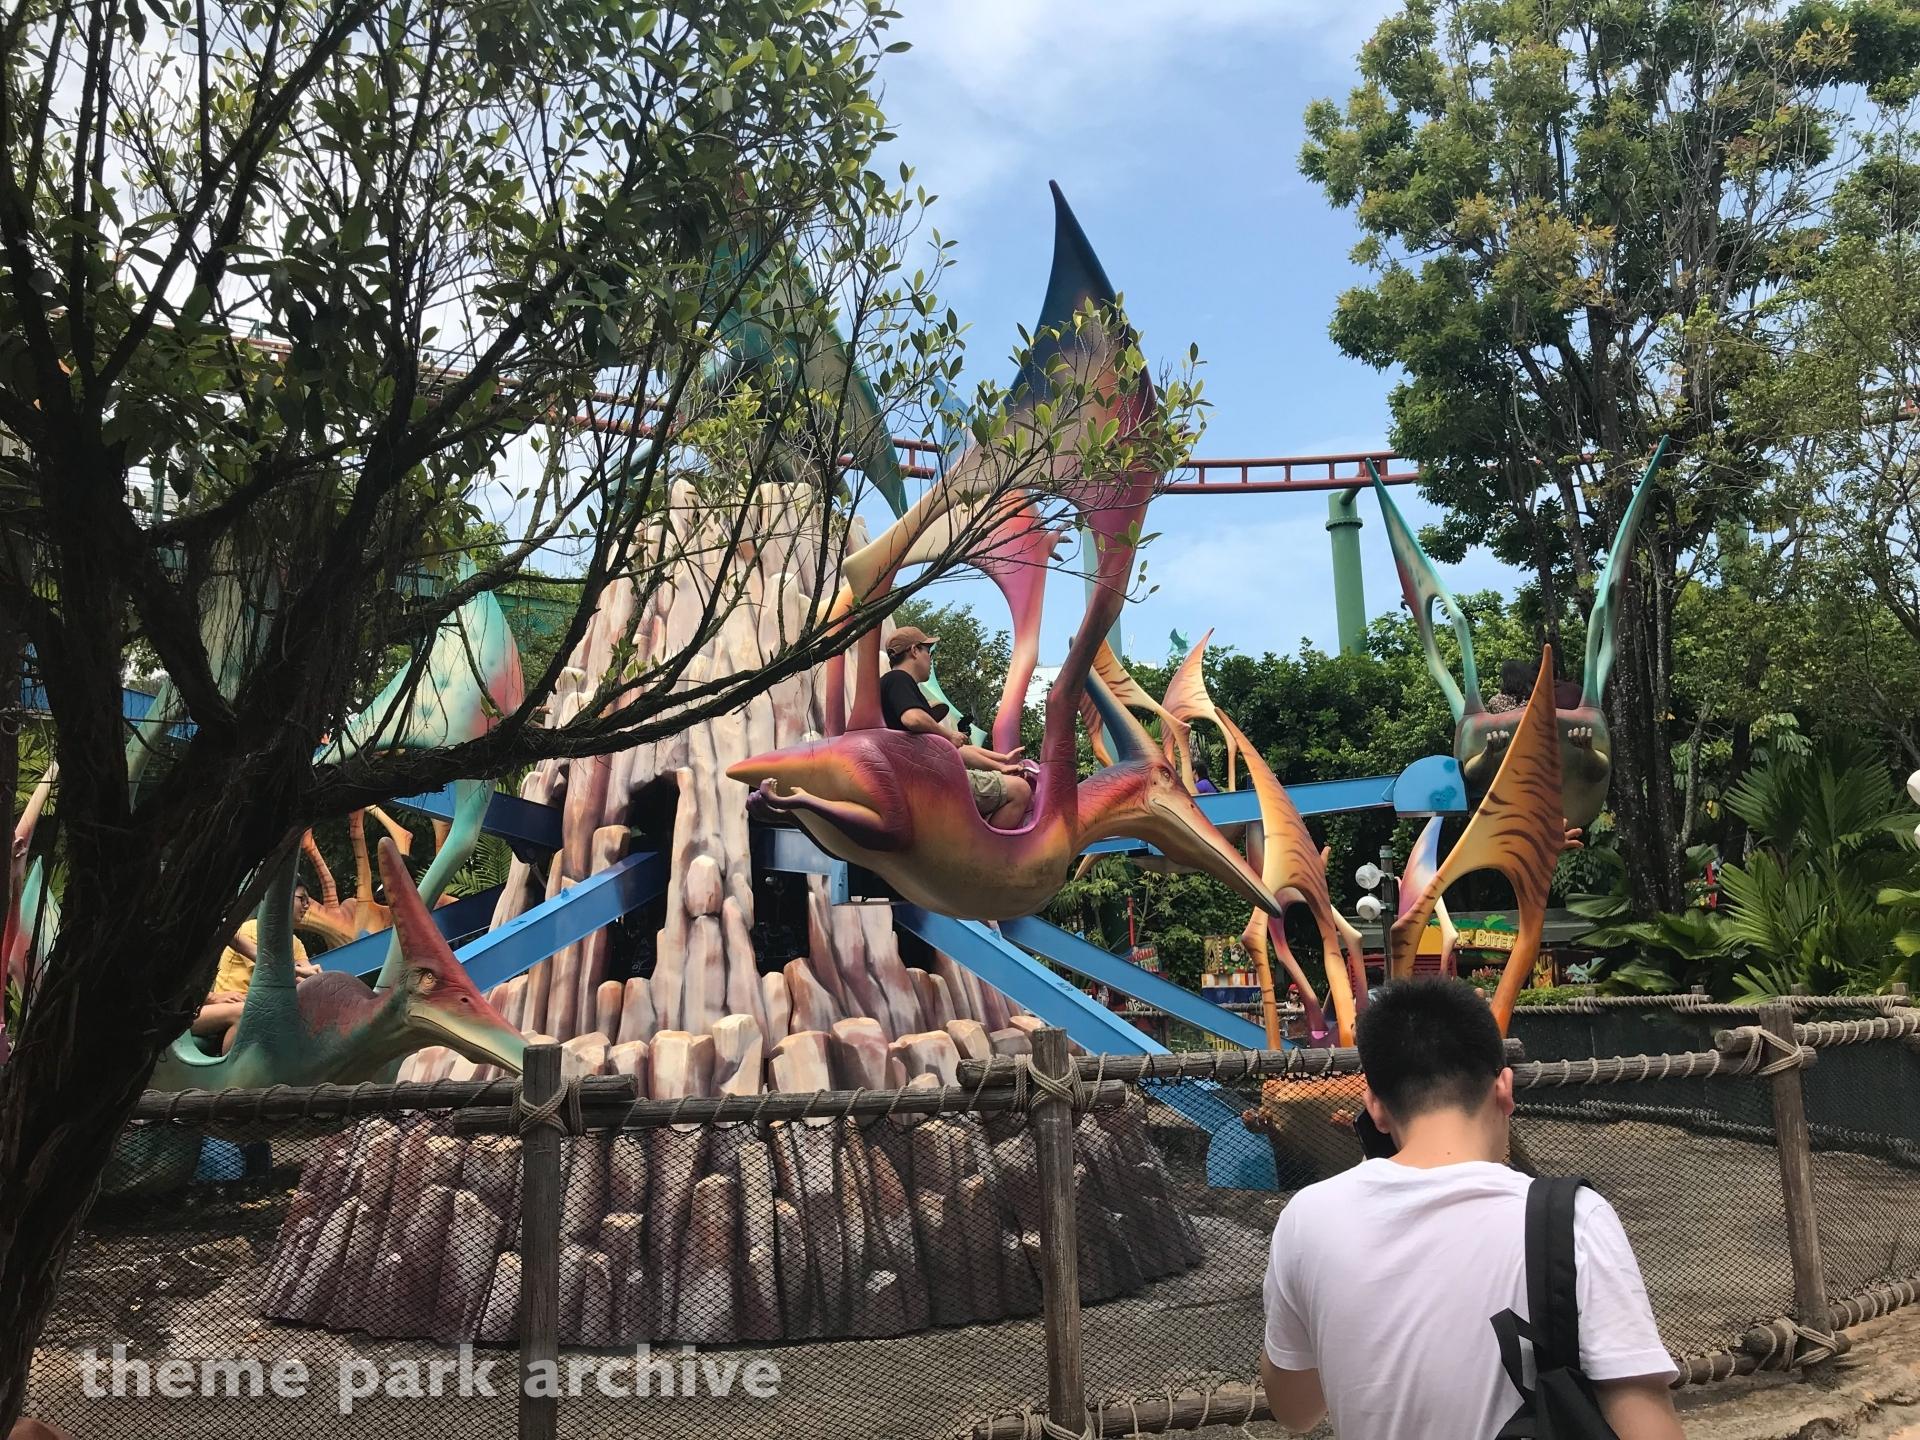 Dino Soarin at Universal Studios Singapore